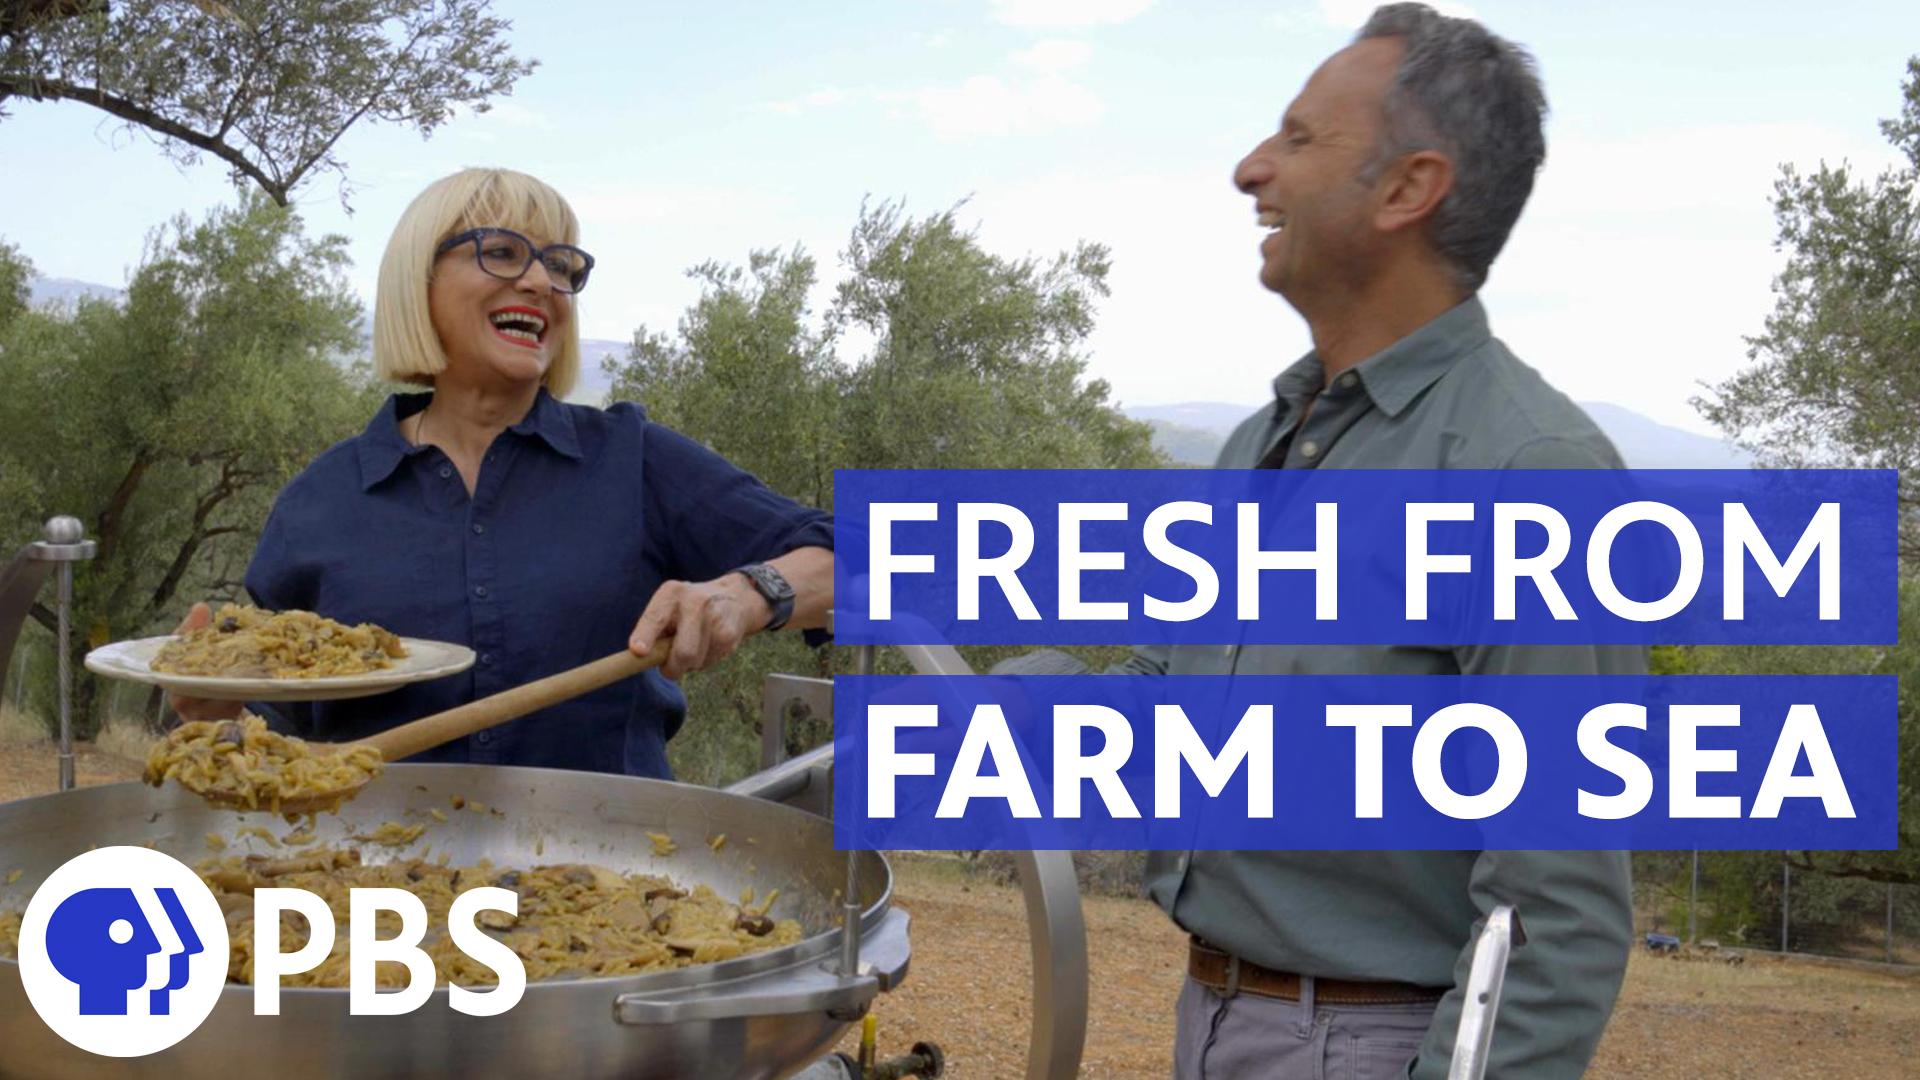 Life of Loi: Fresh from Farm to Sea